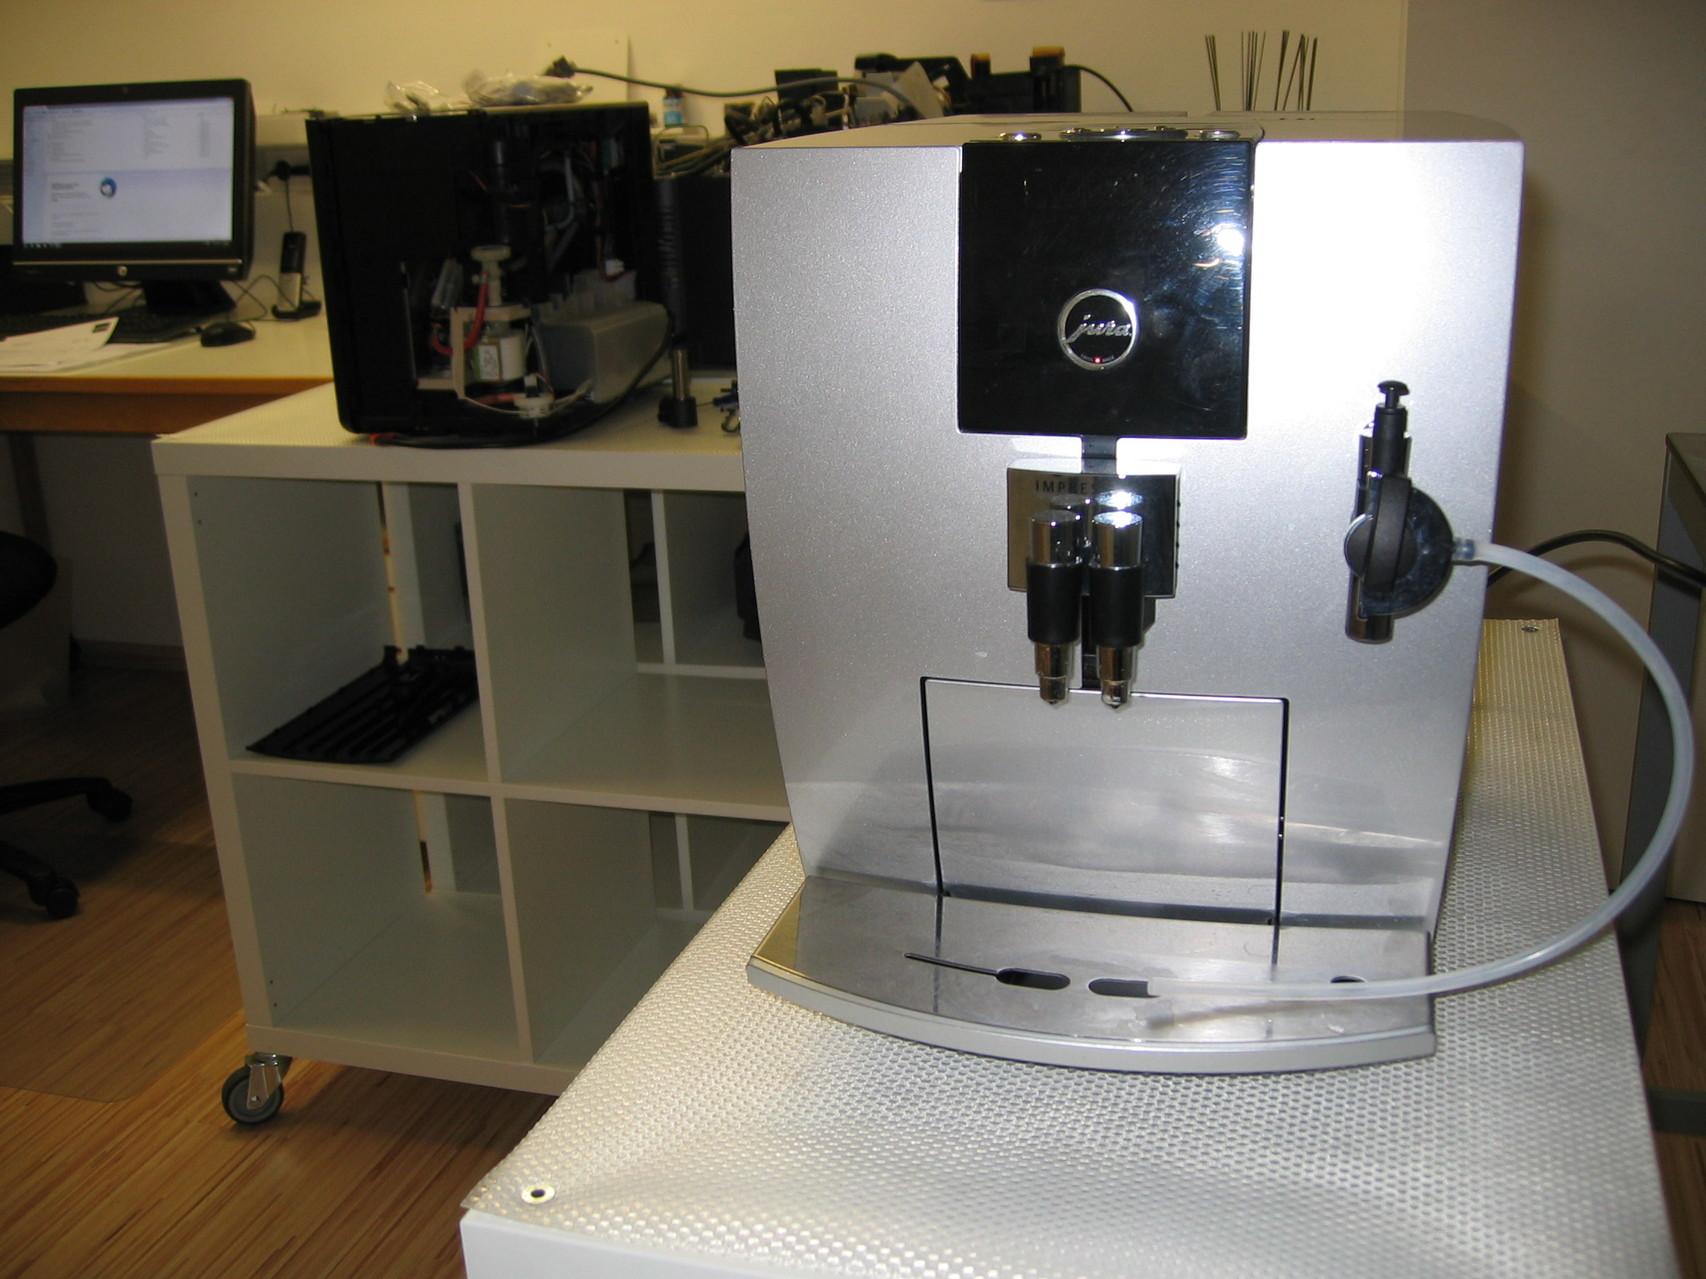 Werkstatt Impressionen - Jura Kaffeevollautomat